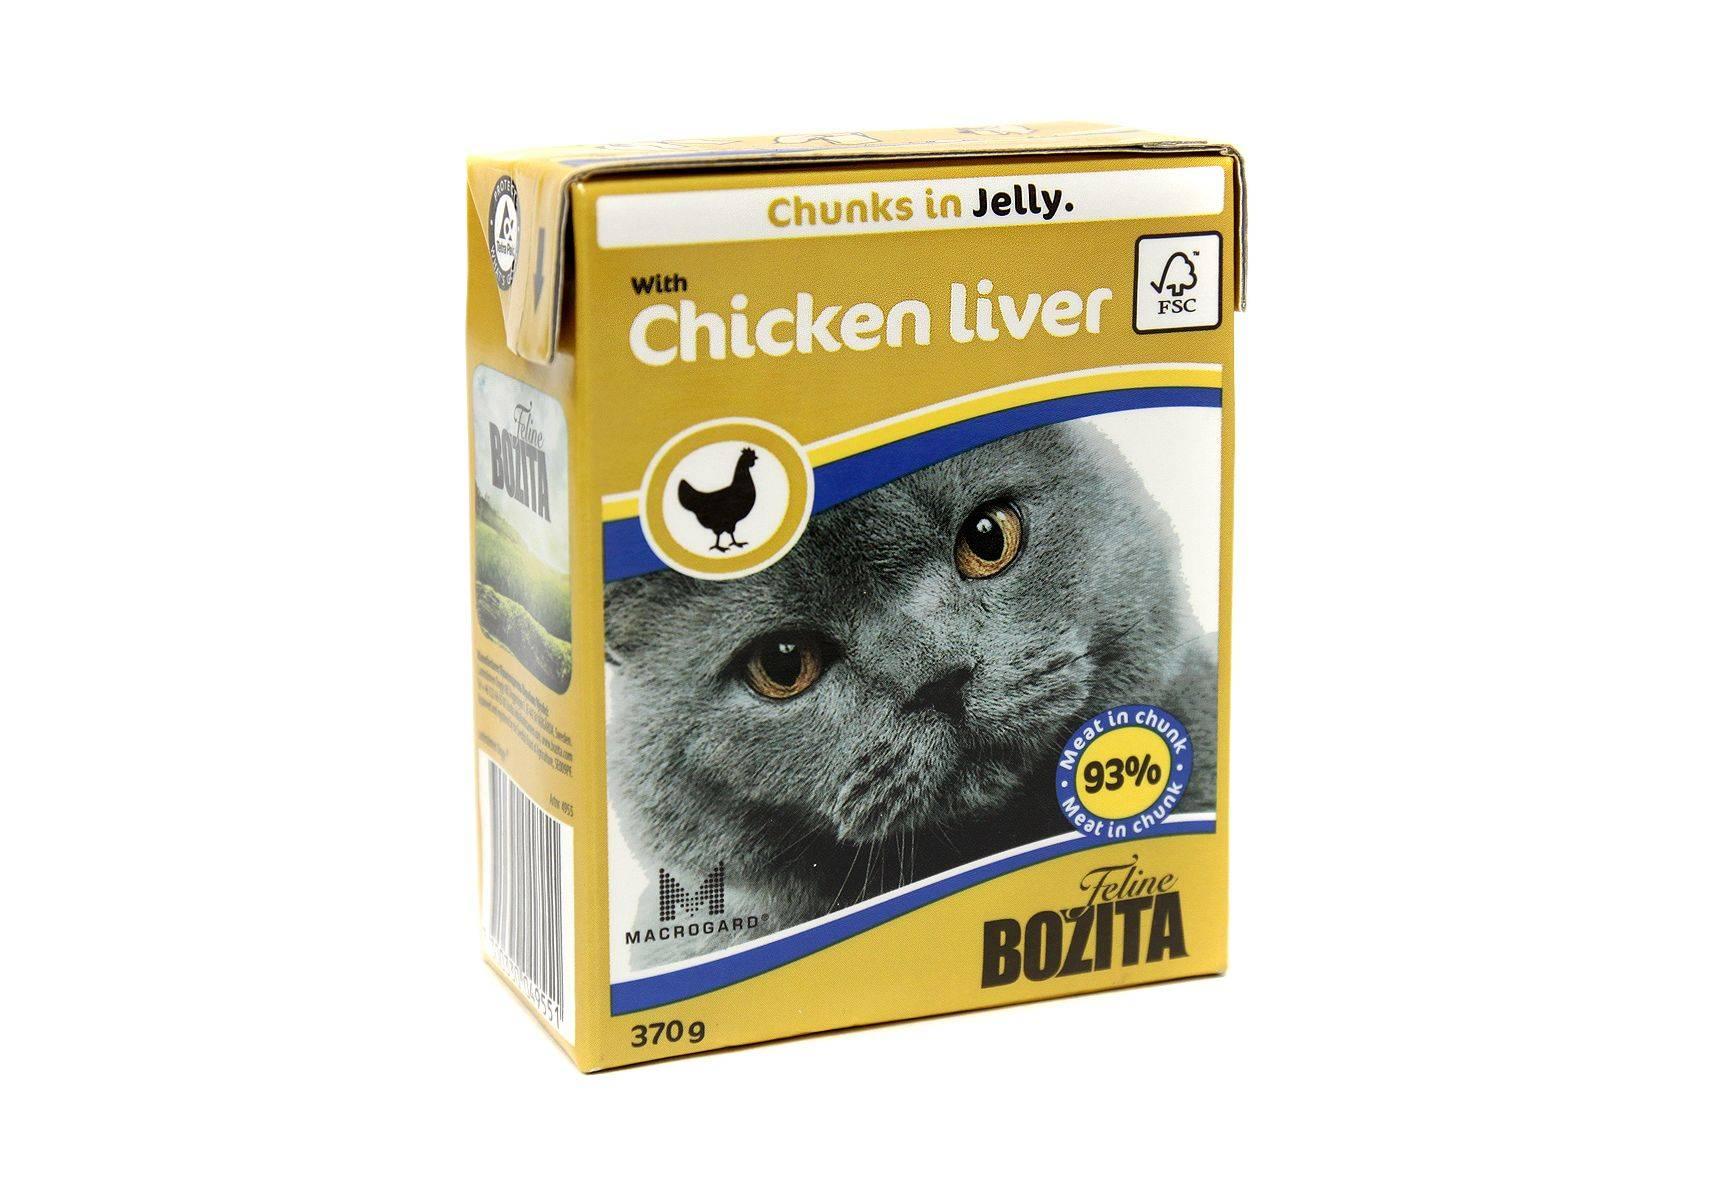 Корм для кошек бозита (bozita): обзор, виды, состав, отзывы